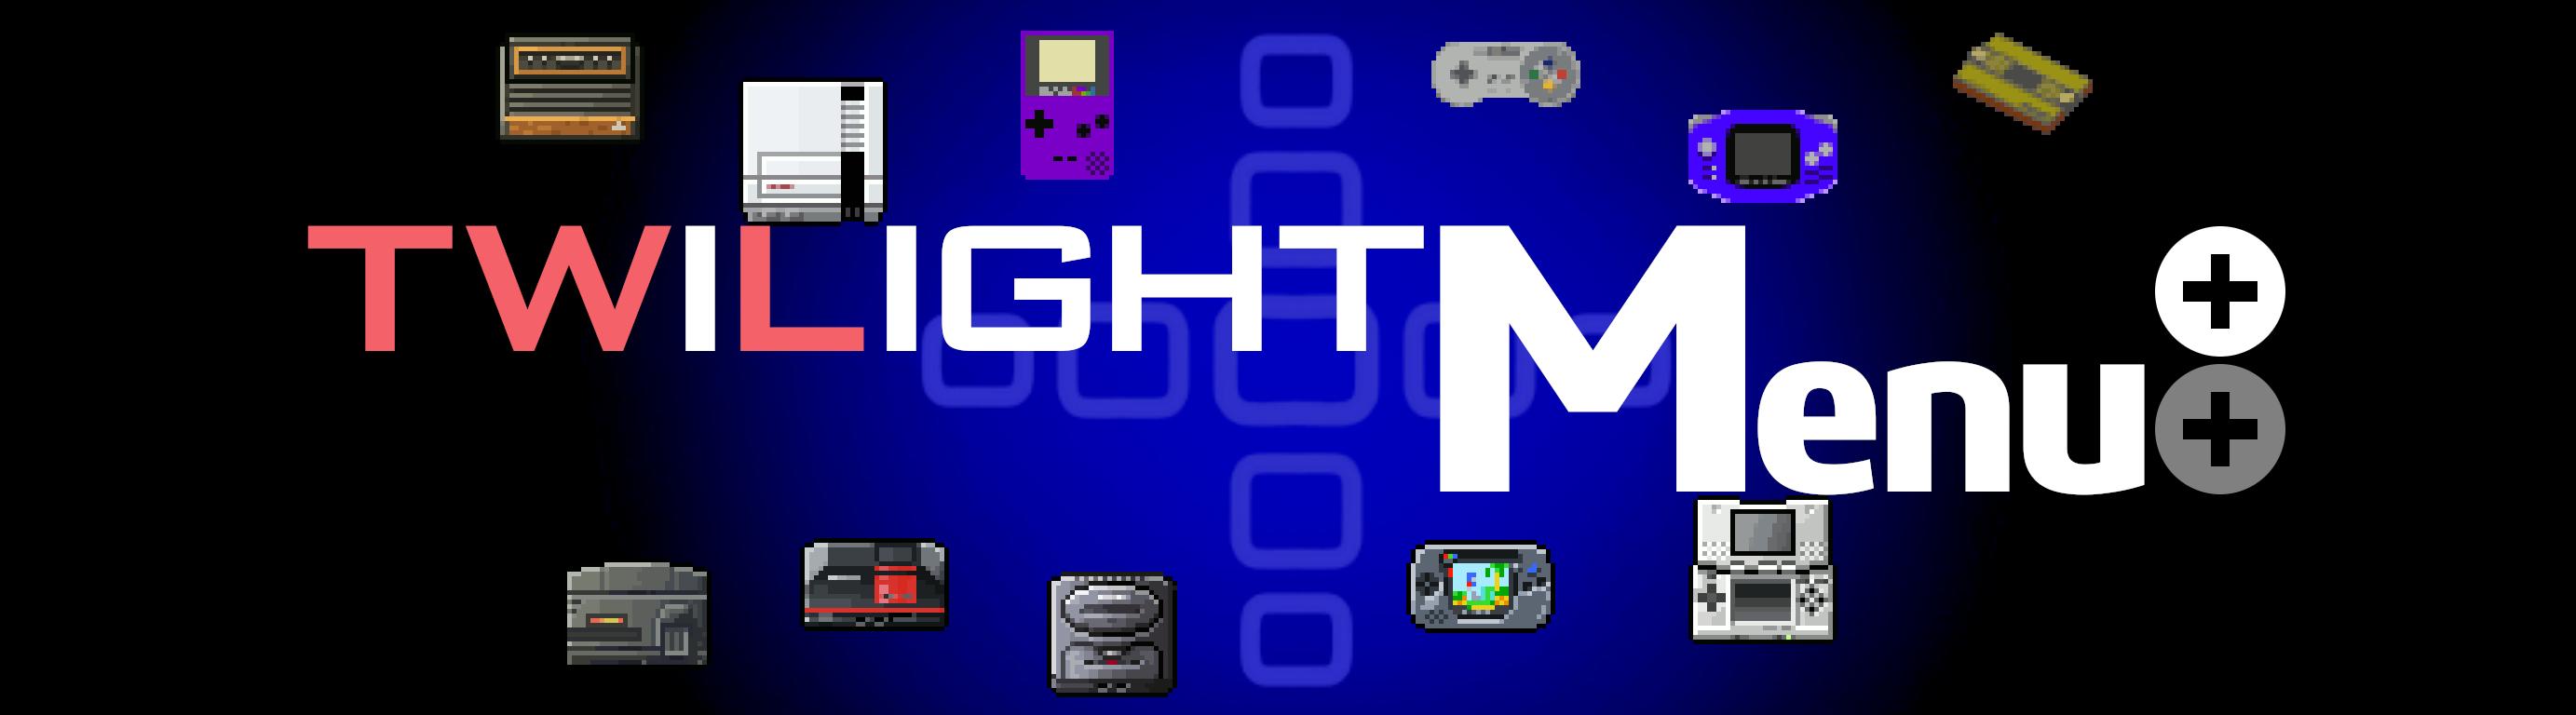 TWiLight Menu++ logo